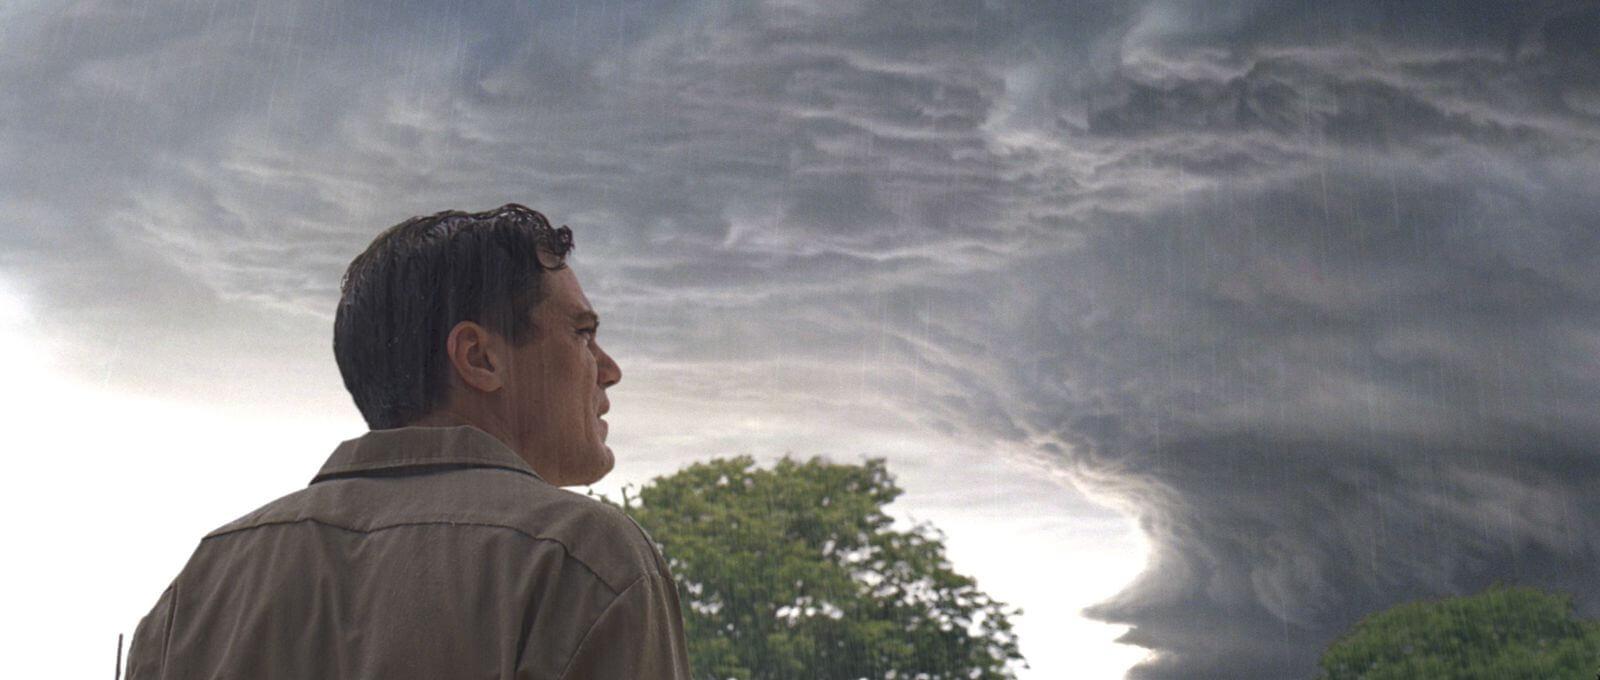 take-shelter-2011-movie